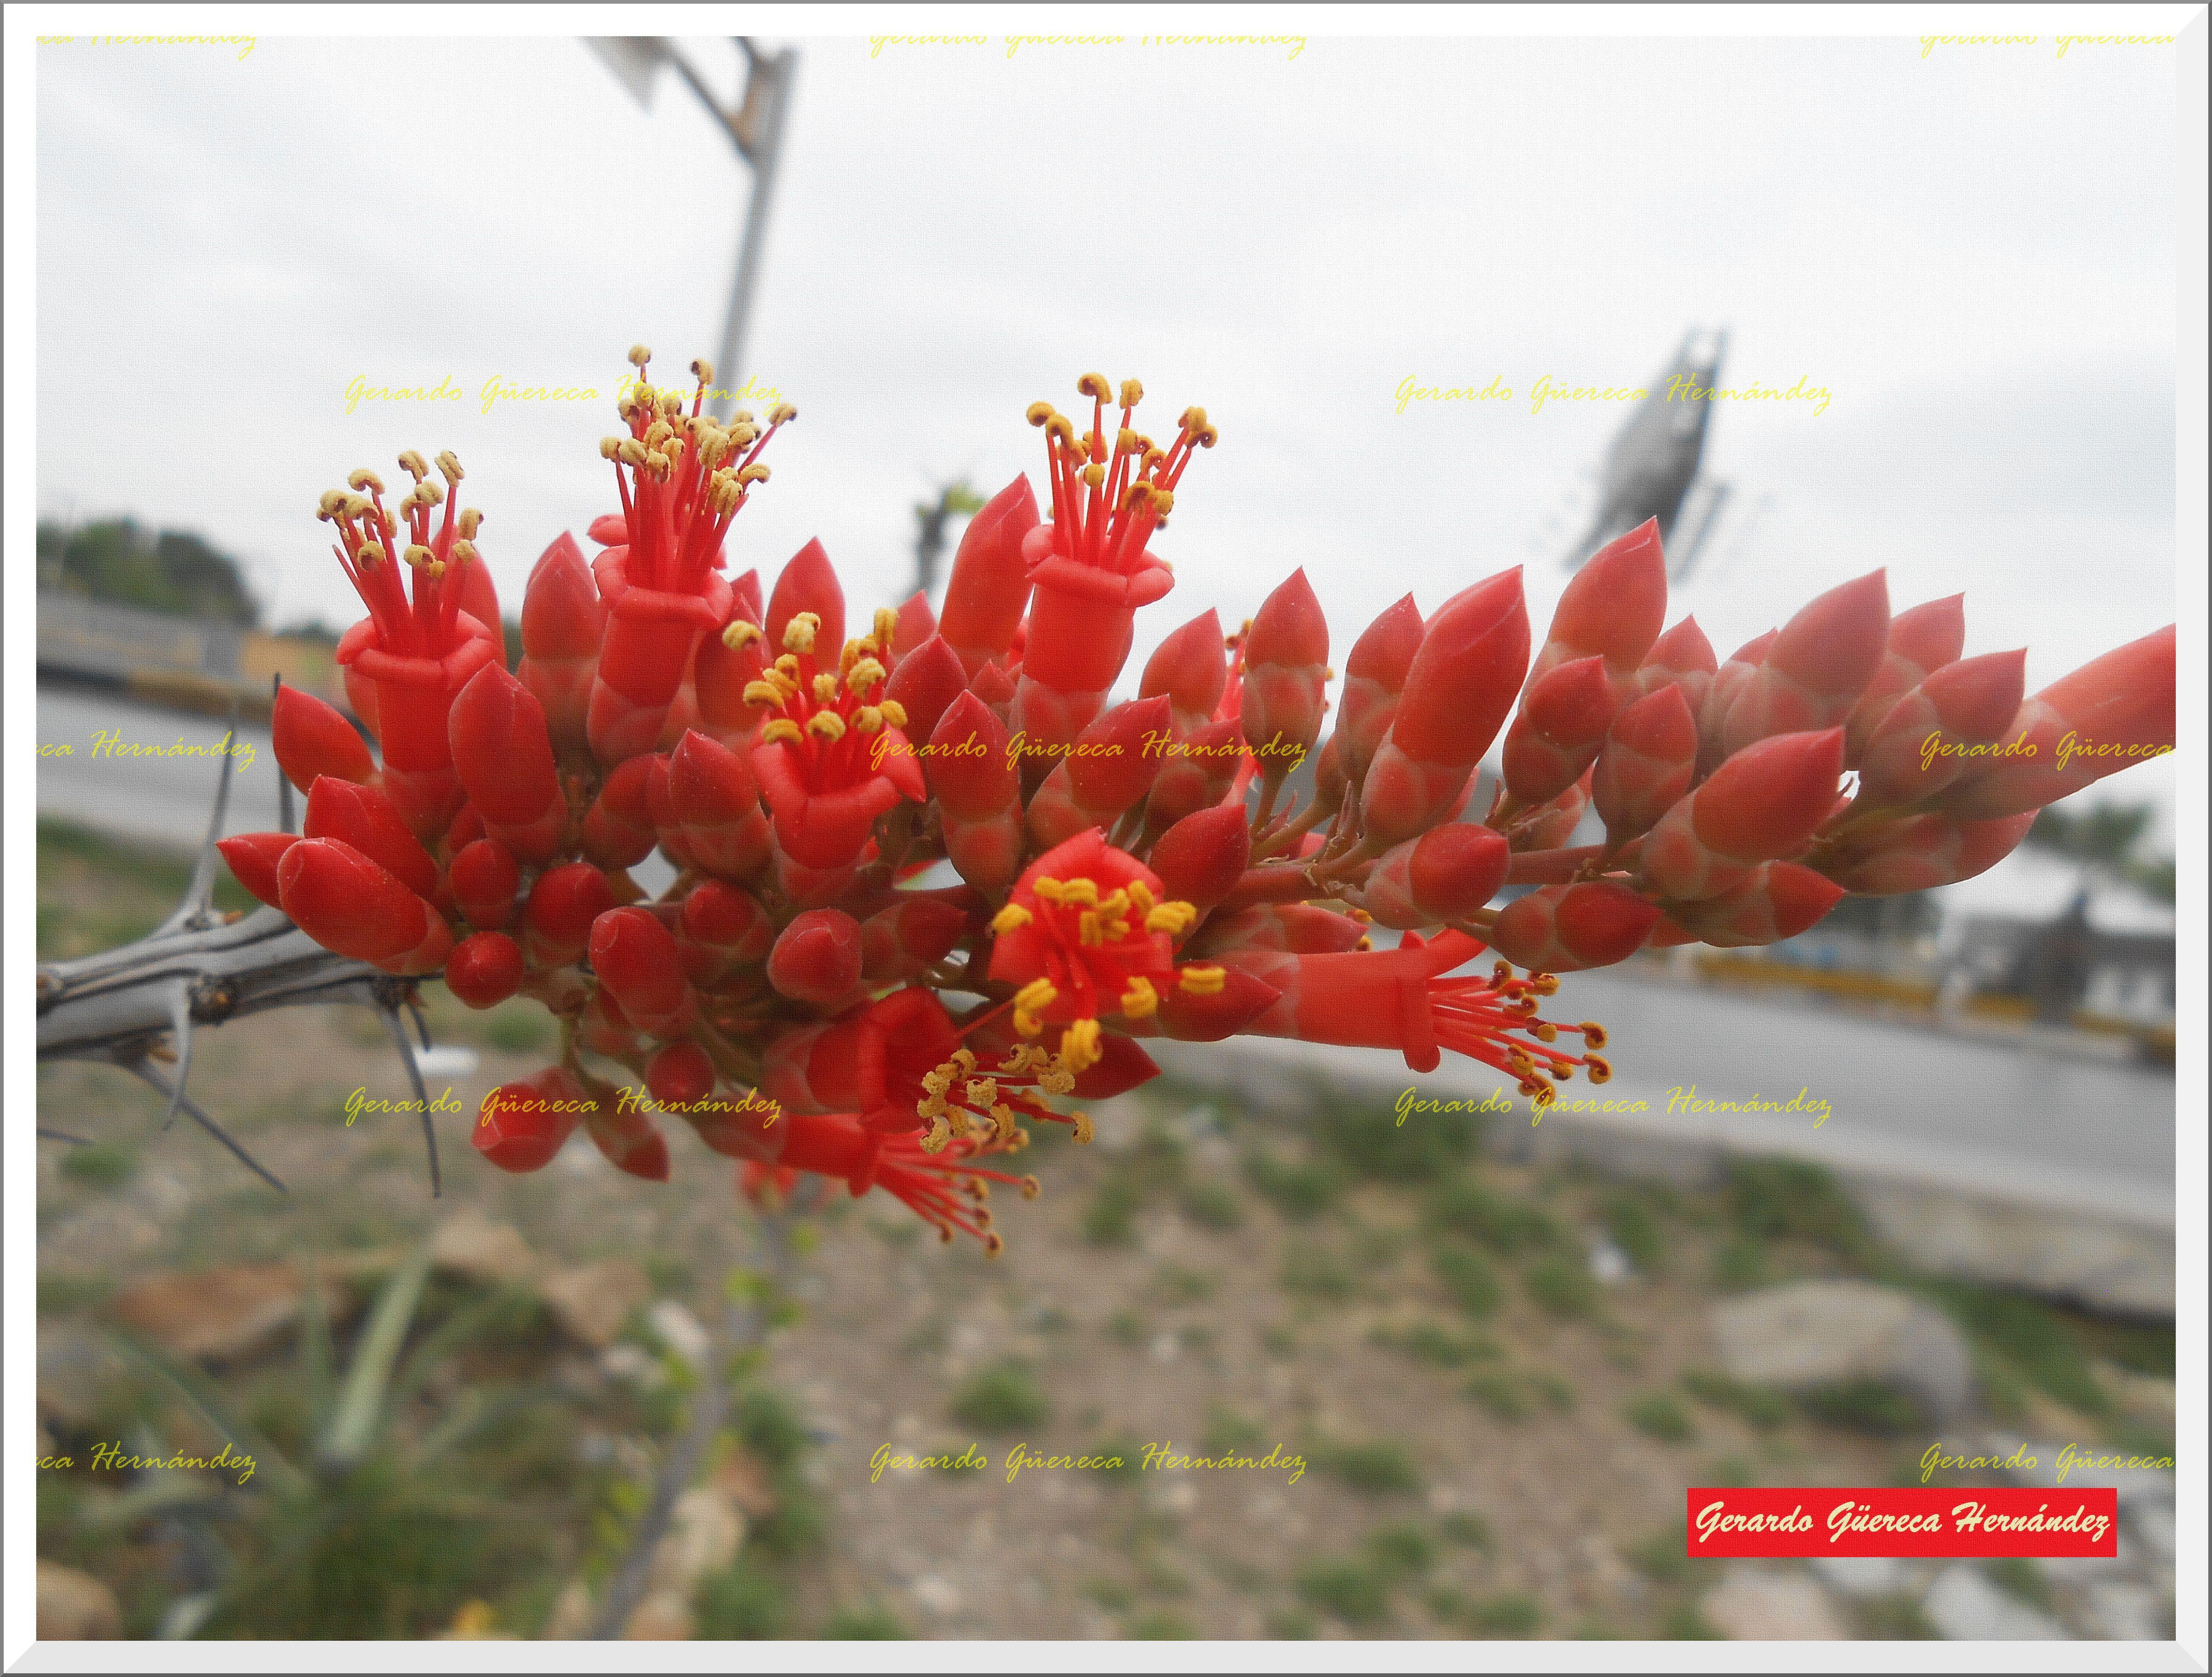 Flowers of Ocotillo (Fouquieria splendens). (Flores de Ocotillo (Fouquieria splendens) .